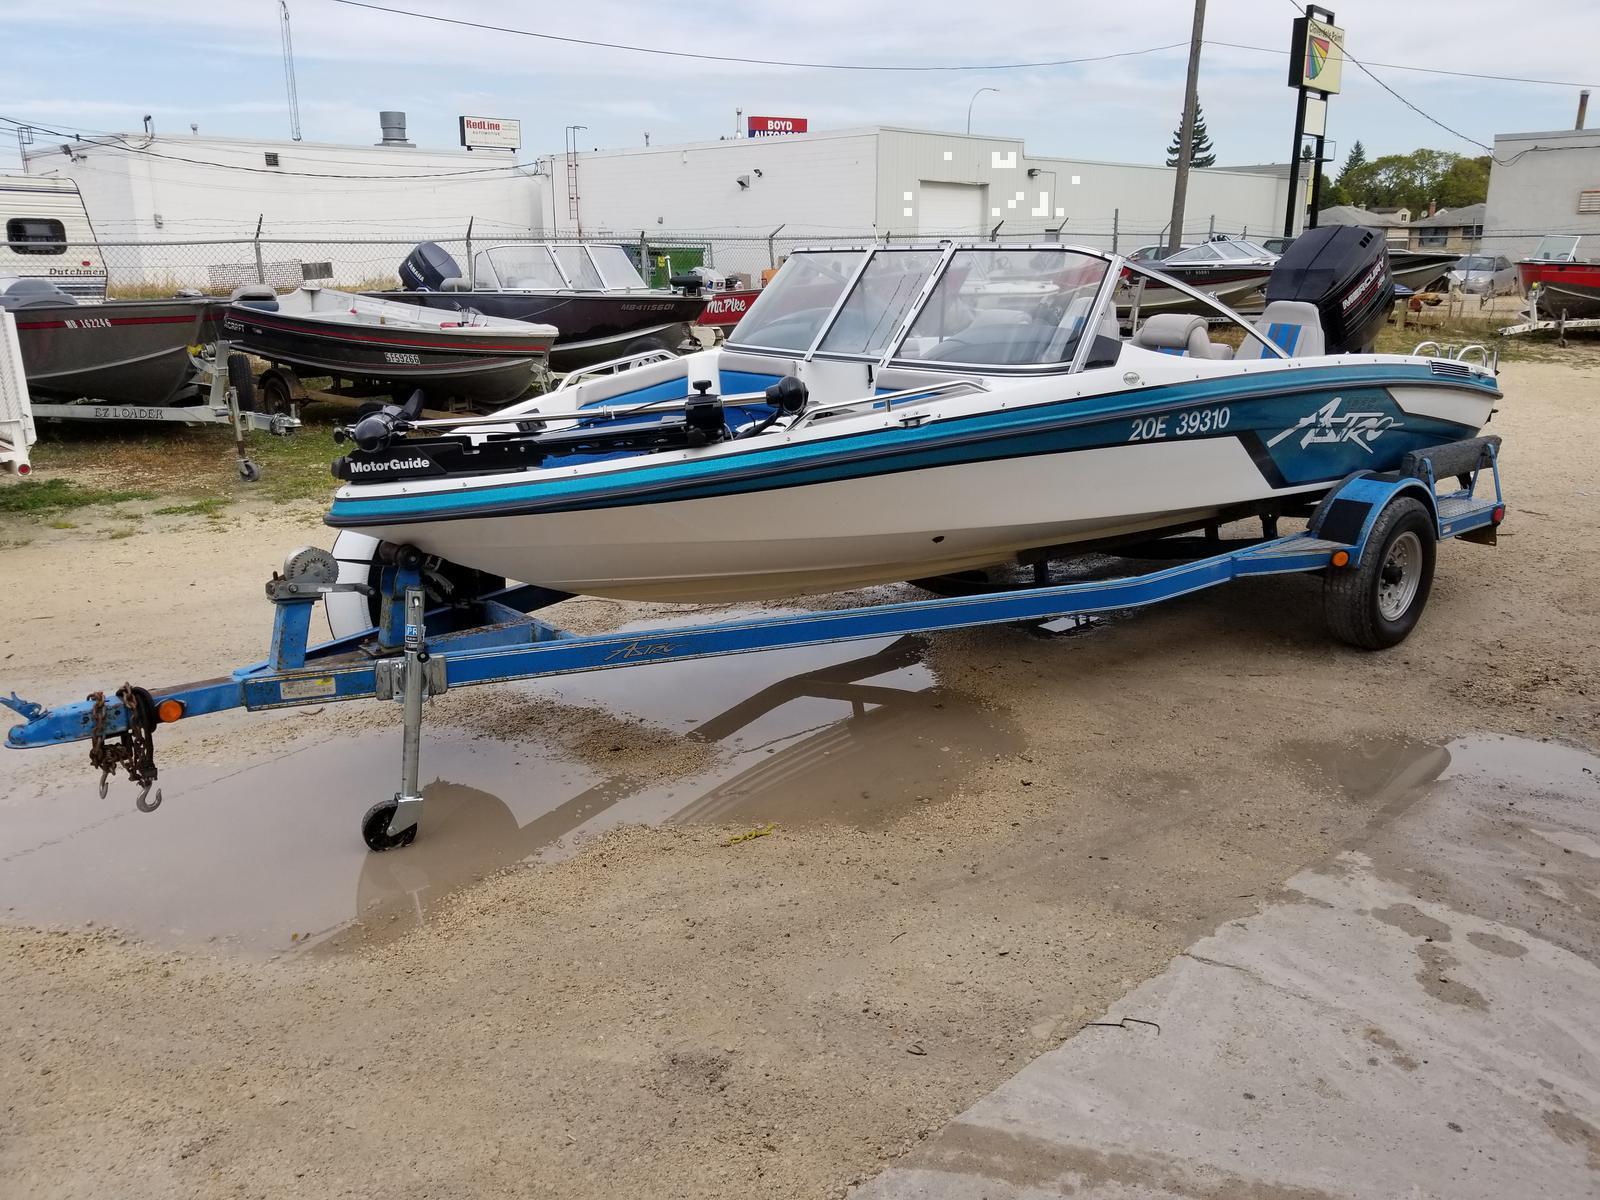 1995 Astro 181 For Sale In East Braintree Mb Alliance Marine Sport East Braintree Mb 800 230 5431